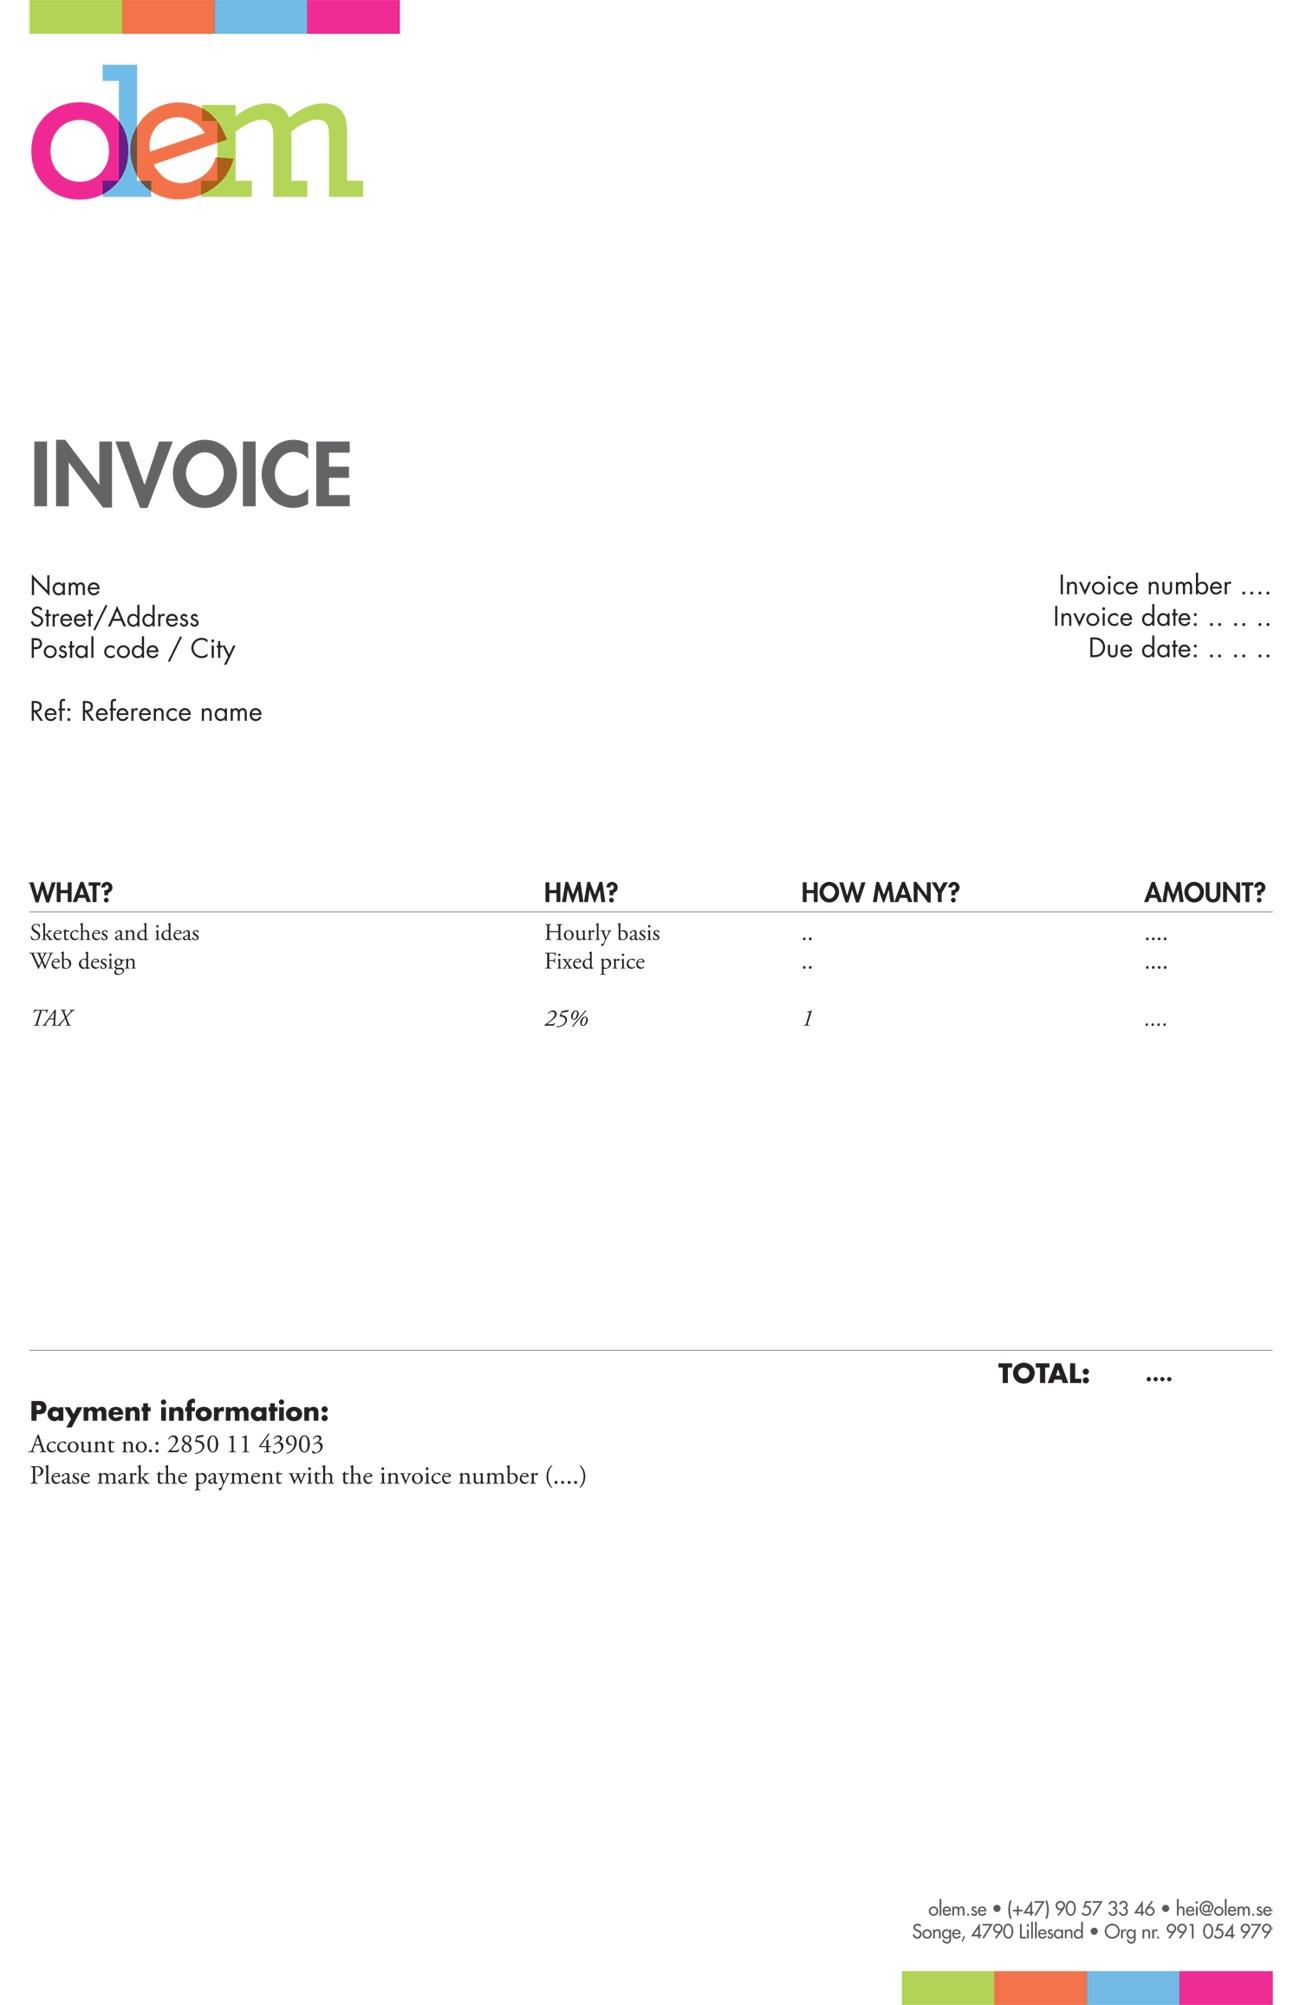 seltar39s soup everything web freelance designer invoice template